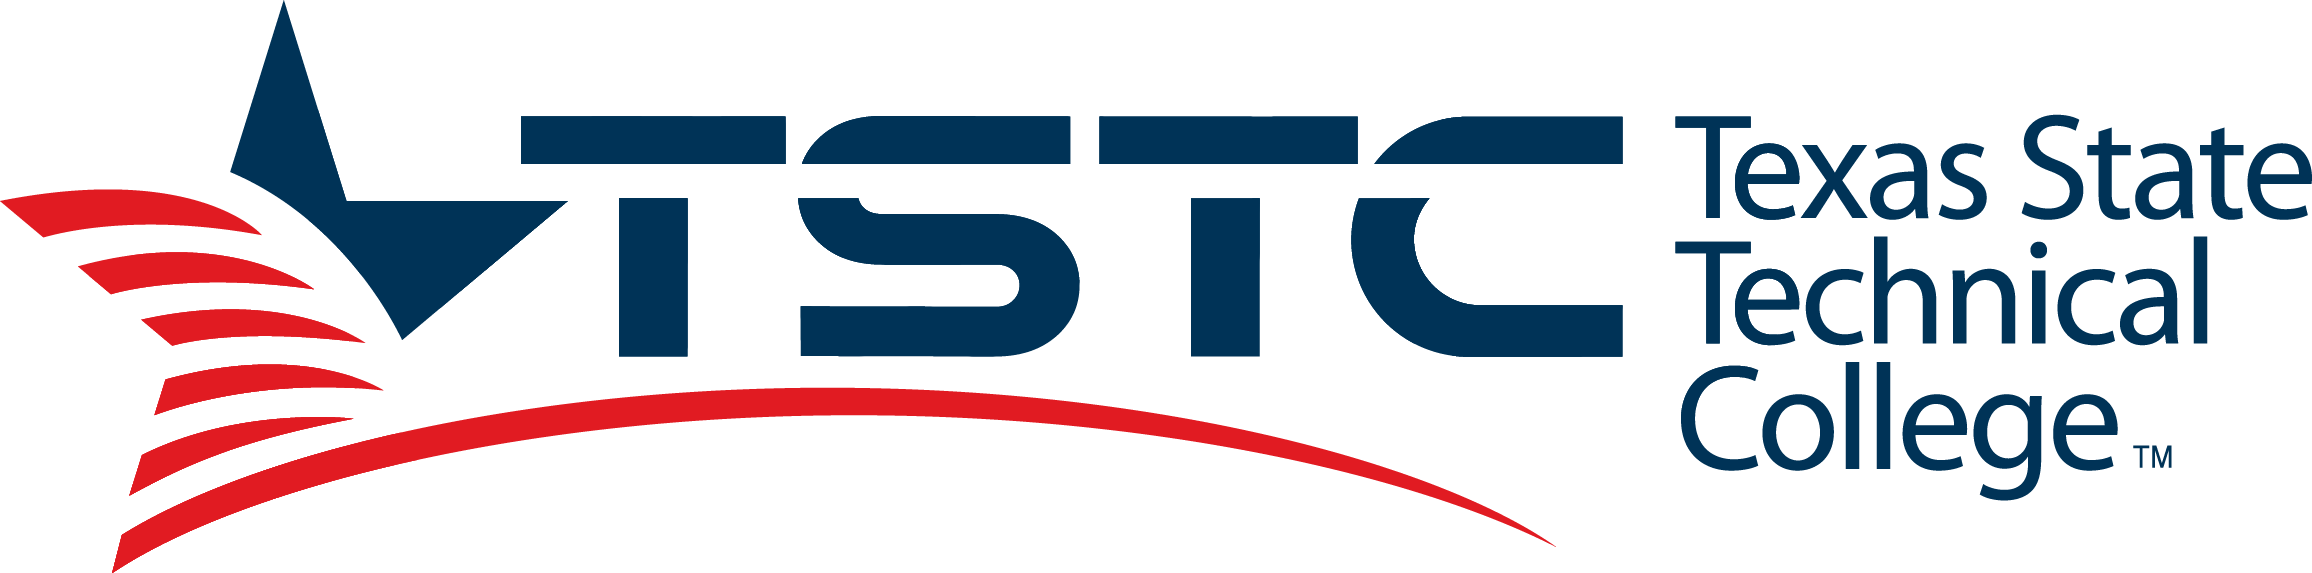 TSTC_Logo_2color_7_0.png